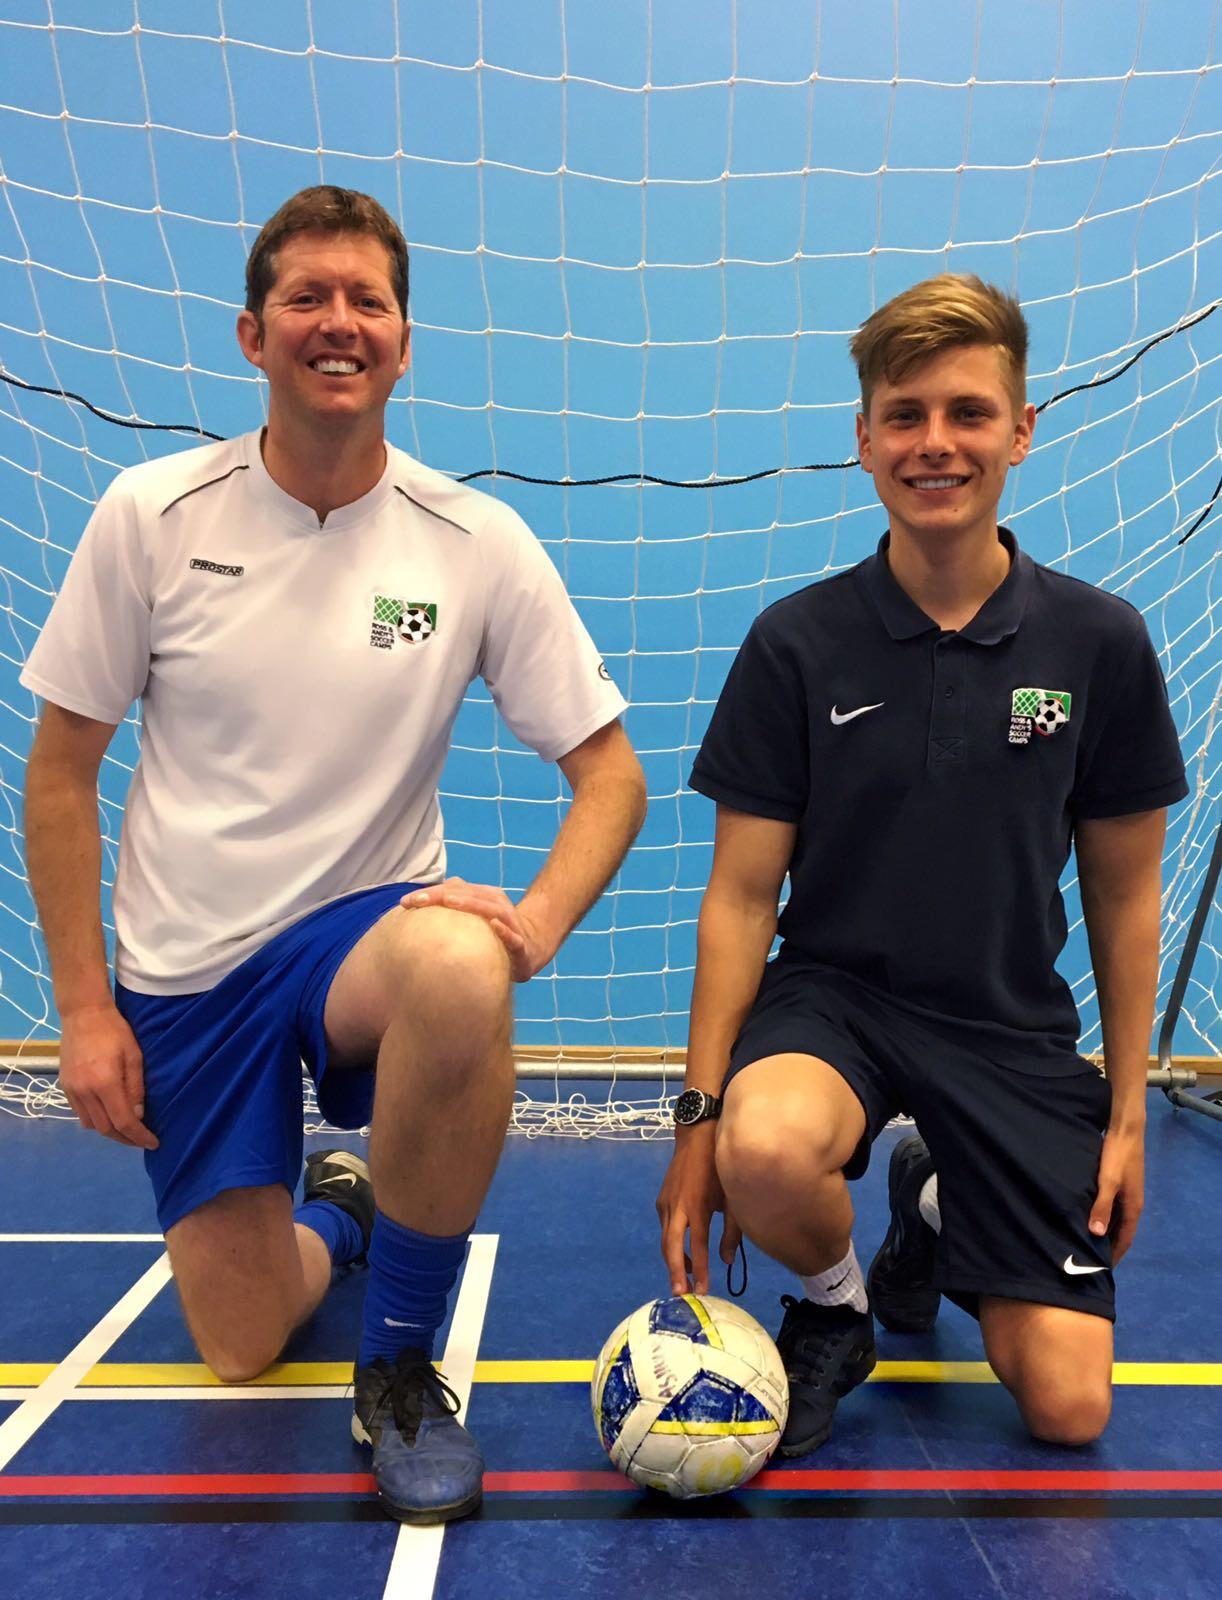 Futsal Coaches